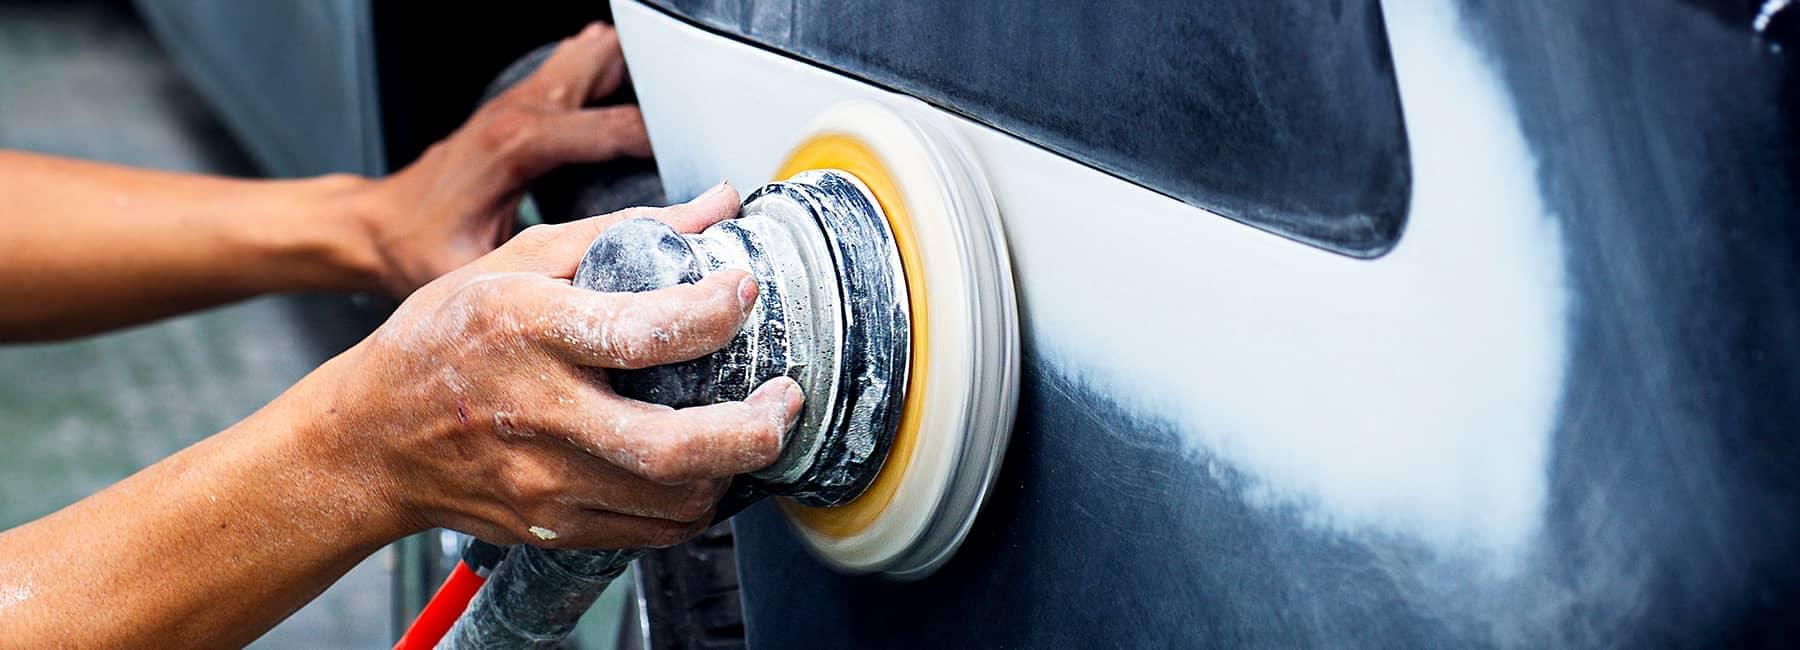 Body shop technician sands down car body